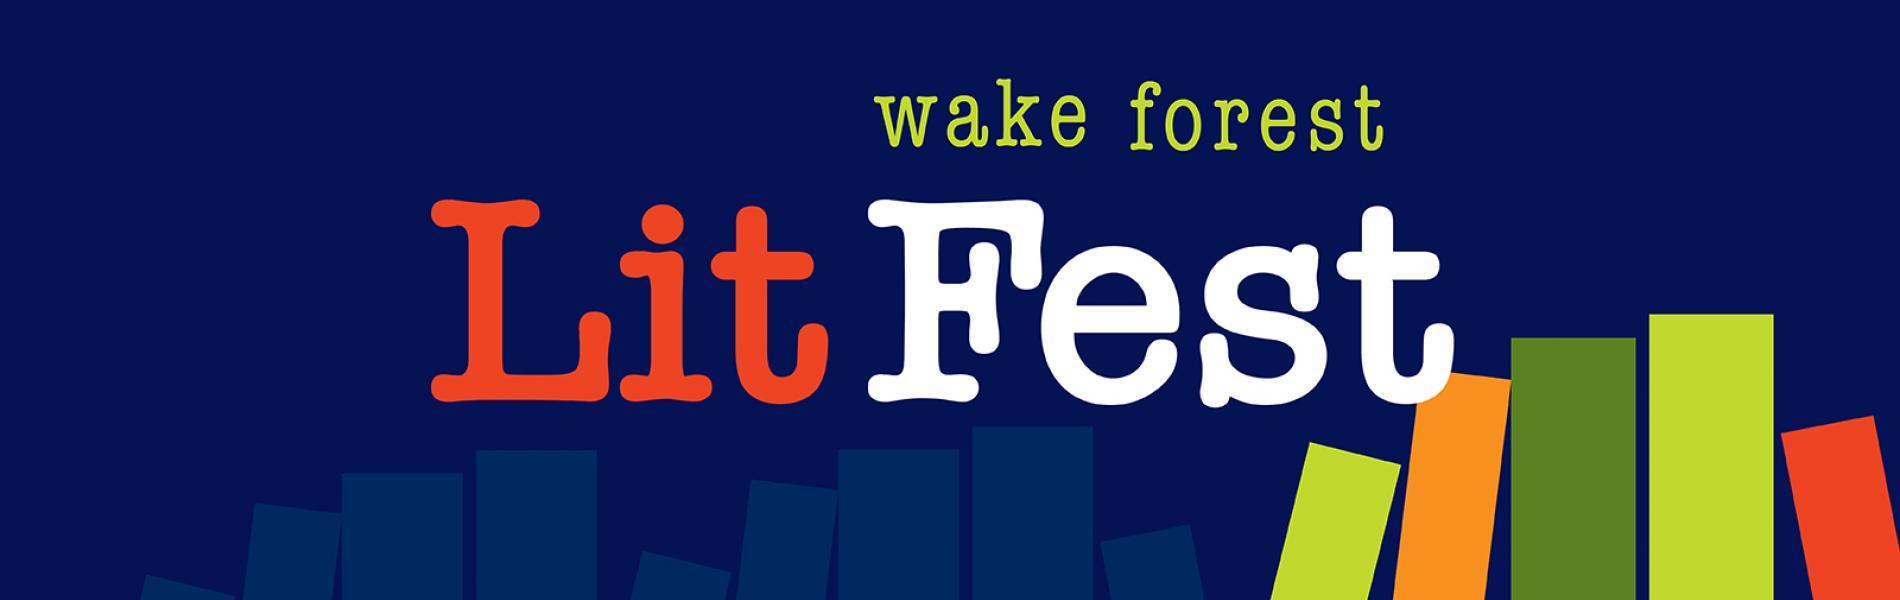 WF Lit Fest